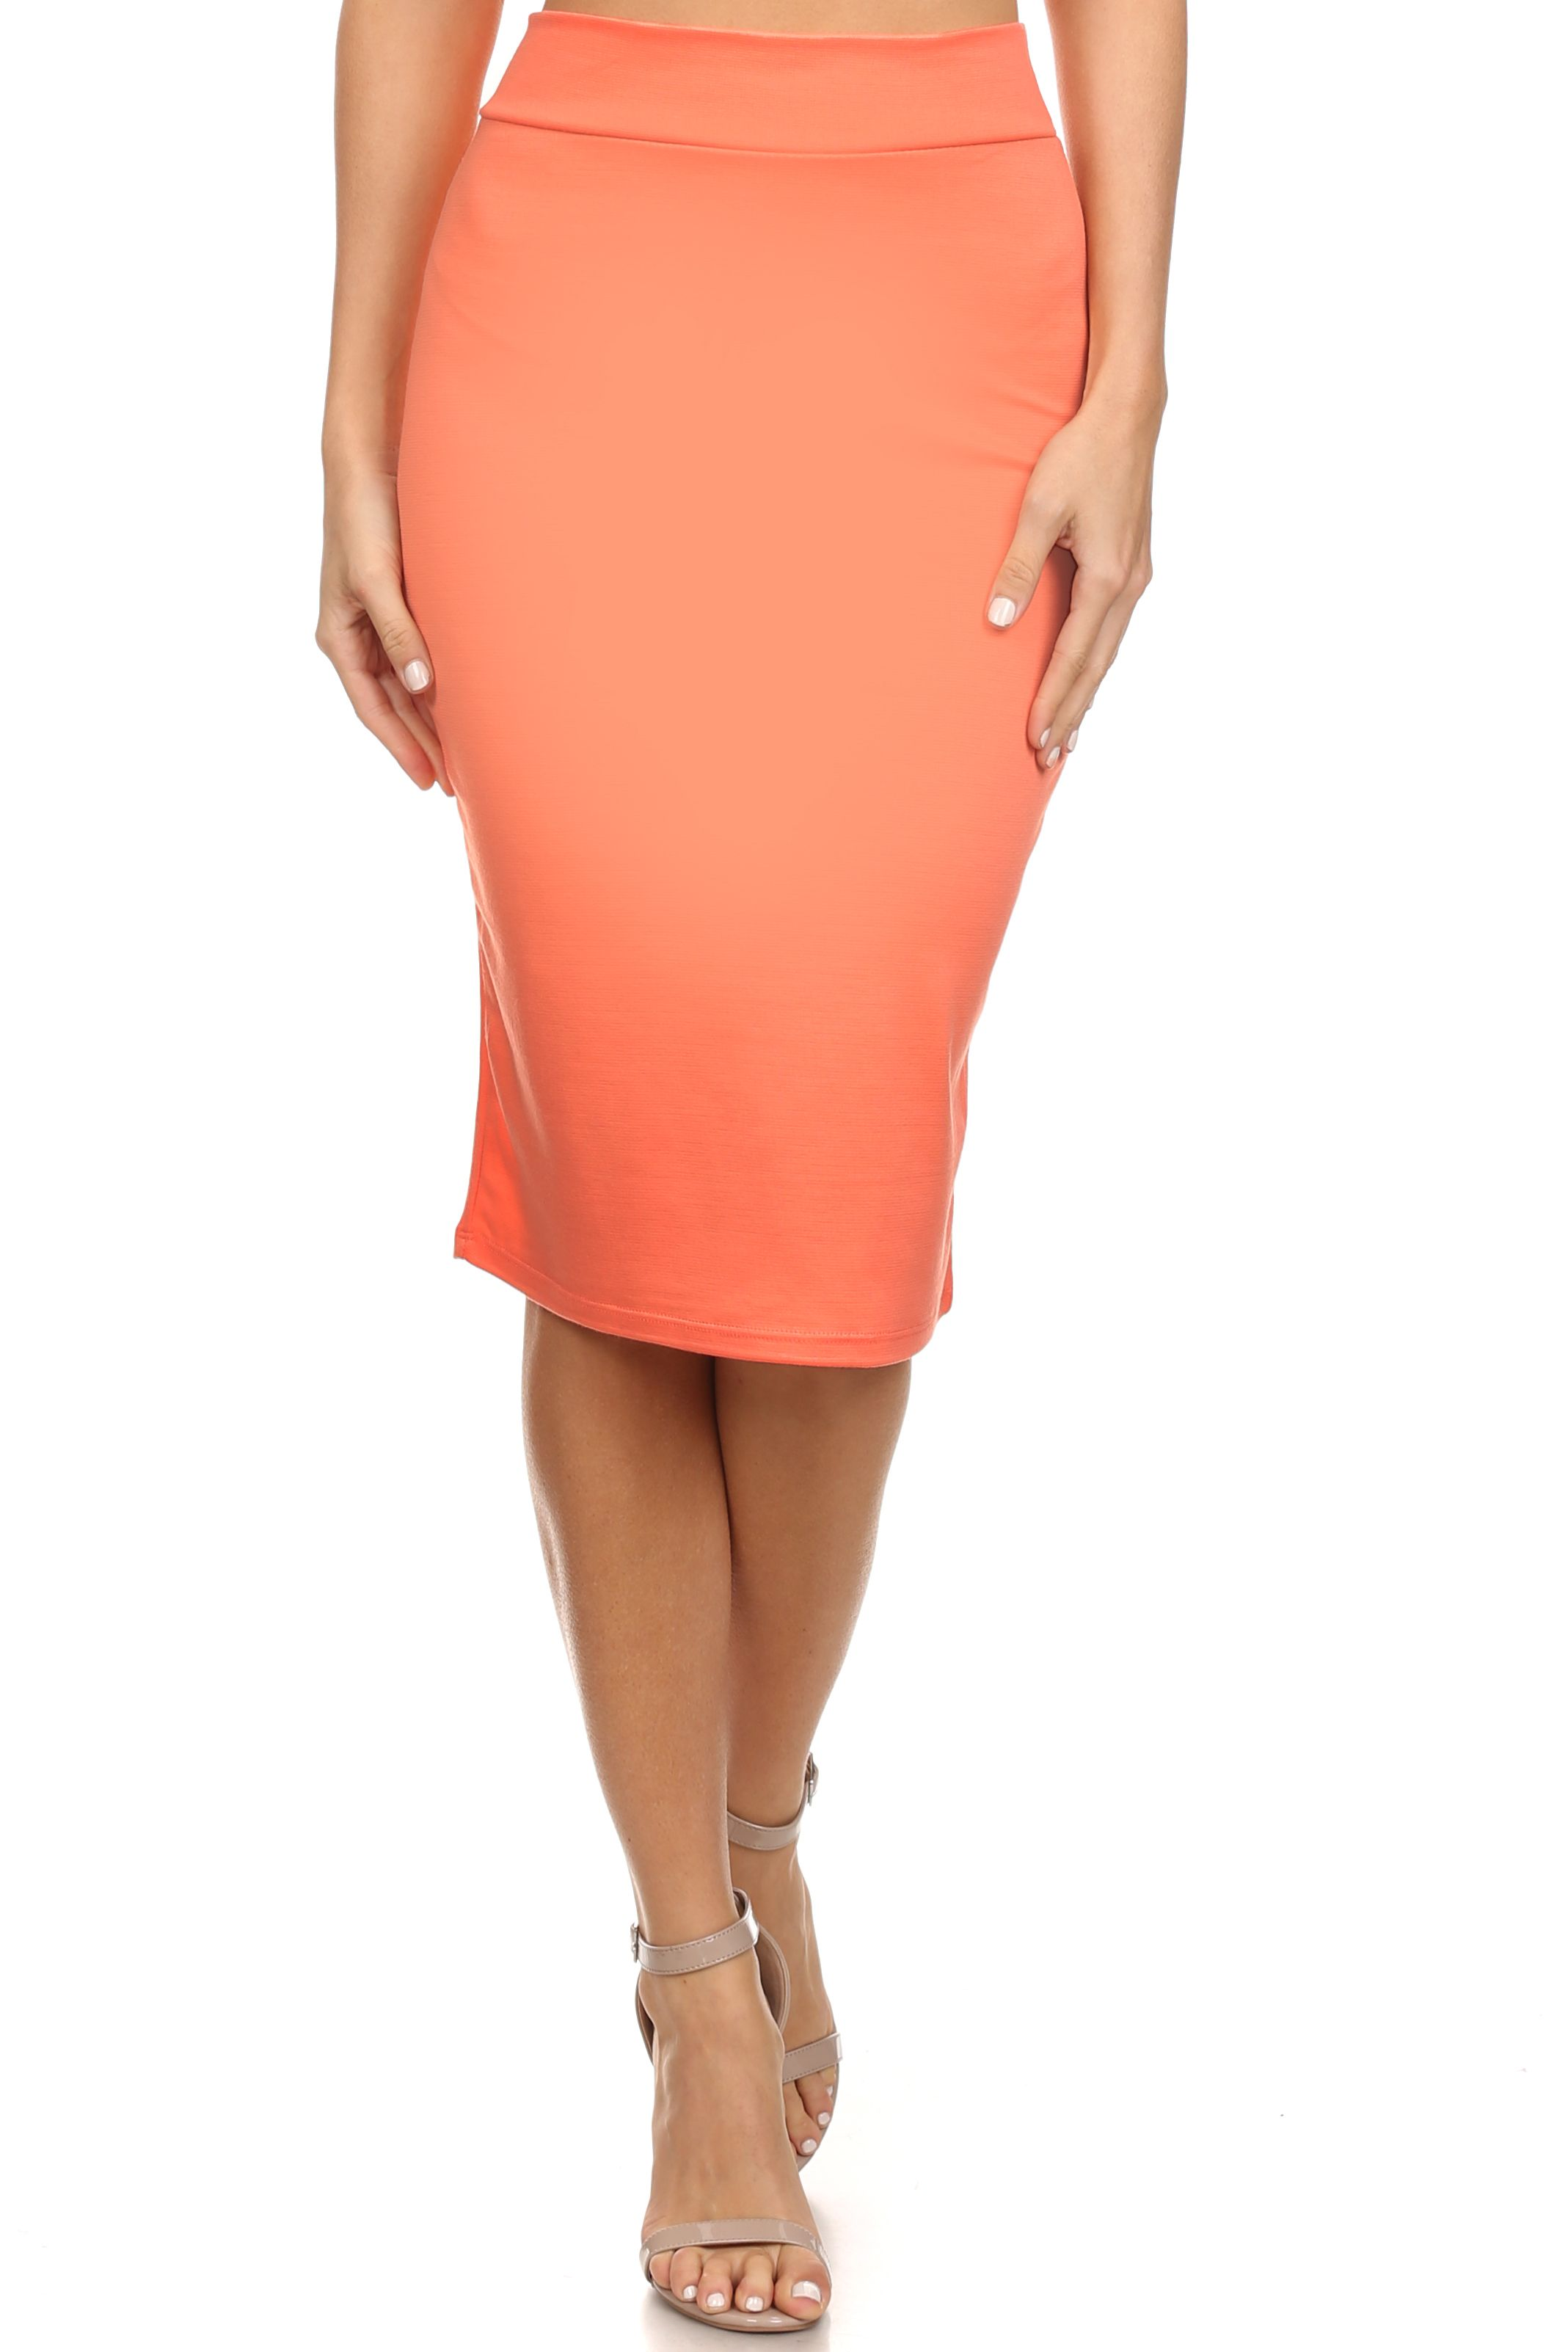 5f66749da4 Cream Below The Knee Pencil Skirt - Data Dynamic AG